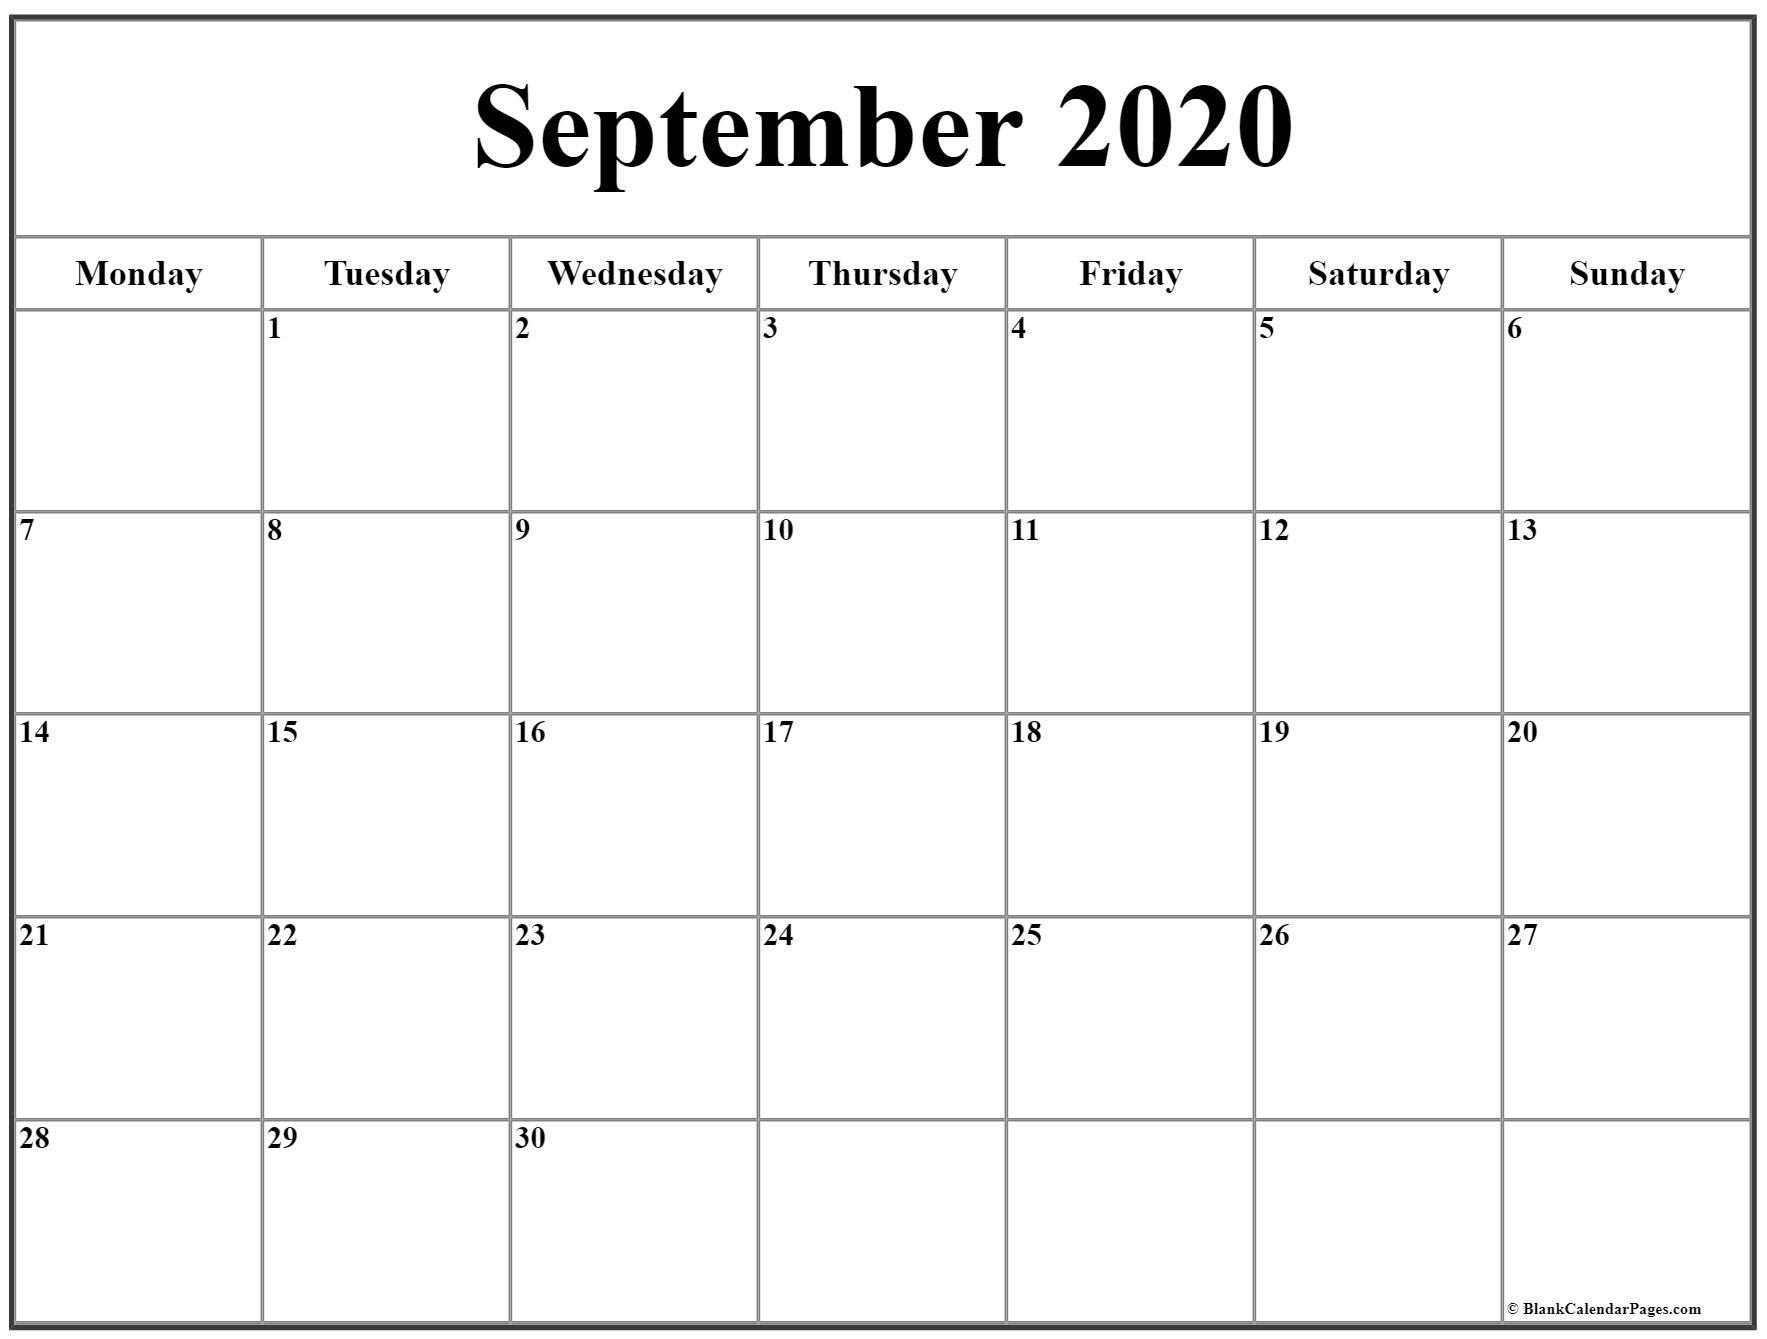 September 2020 Monday Calendar   Monday To Sunday inside Monday Through Sunday